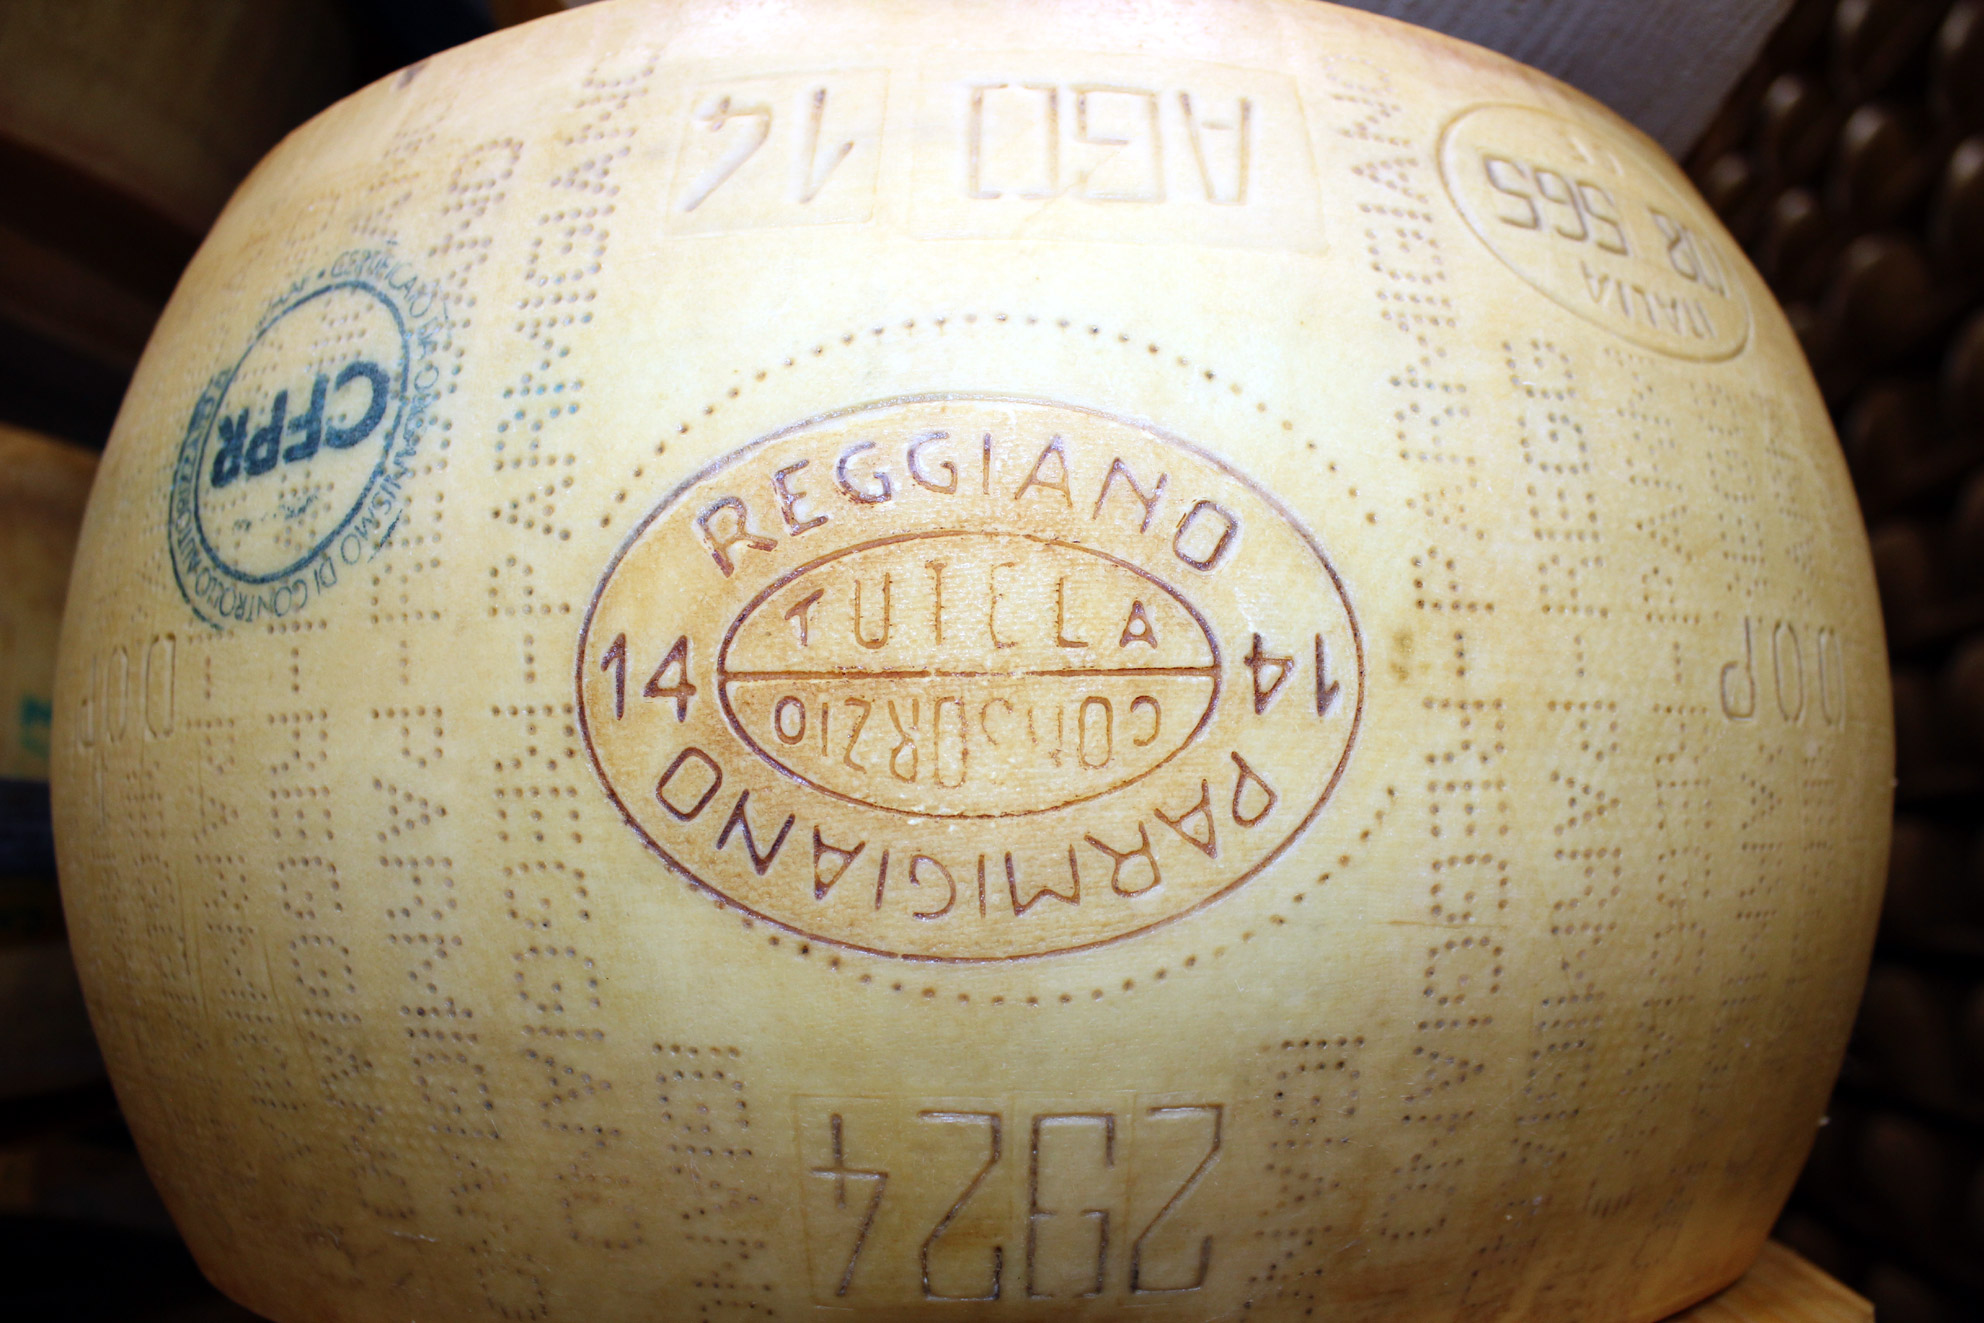 Foto: Parmigiano-Reggiano-ost fra produsenten Hombre